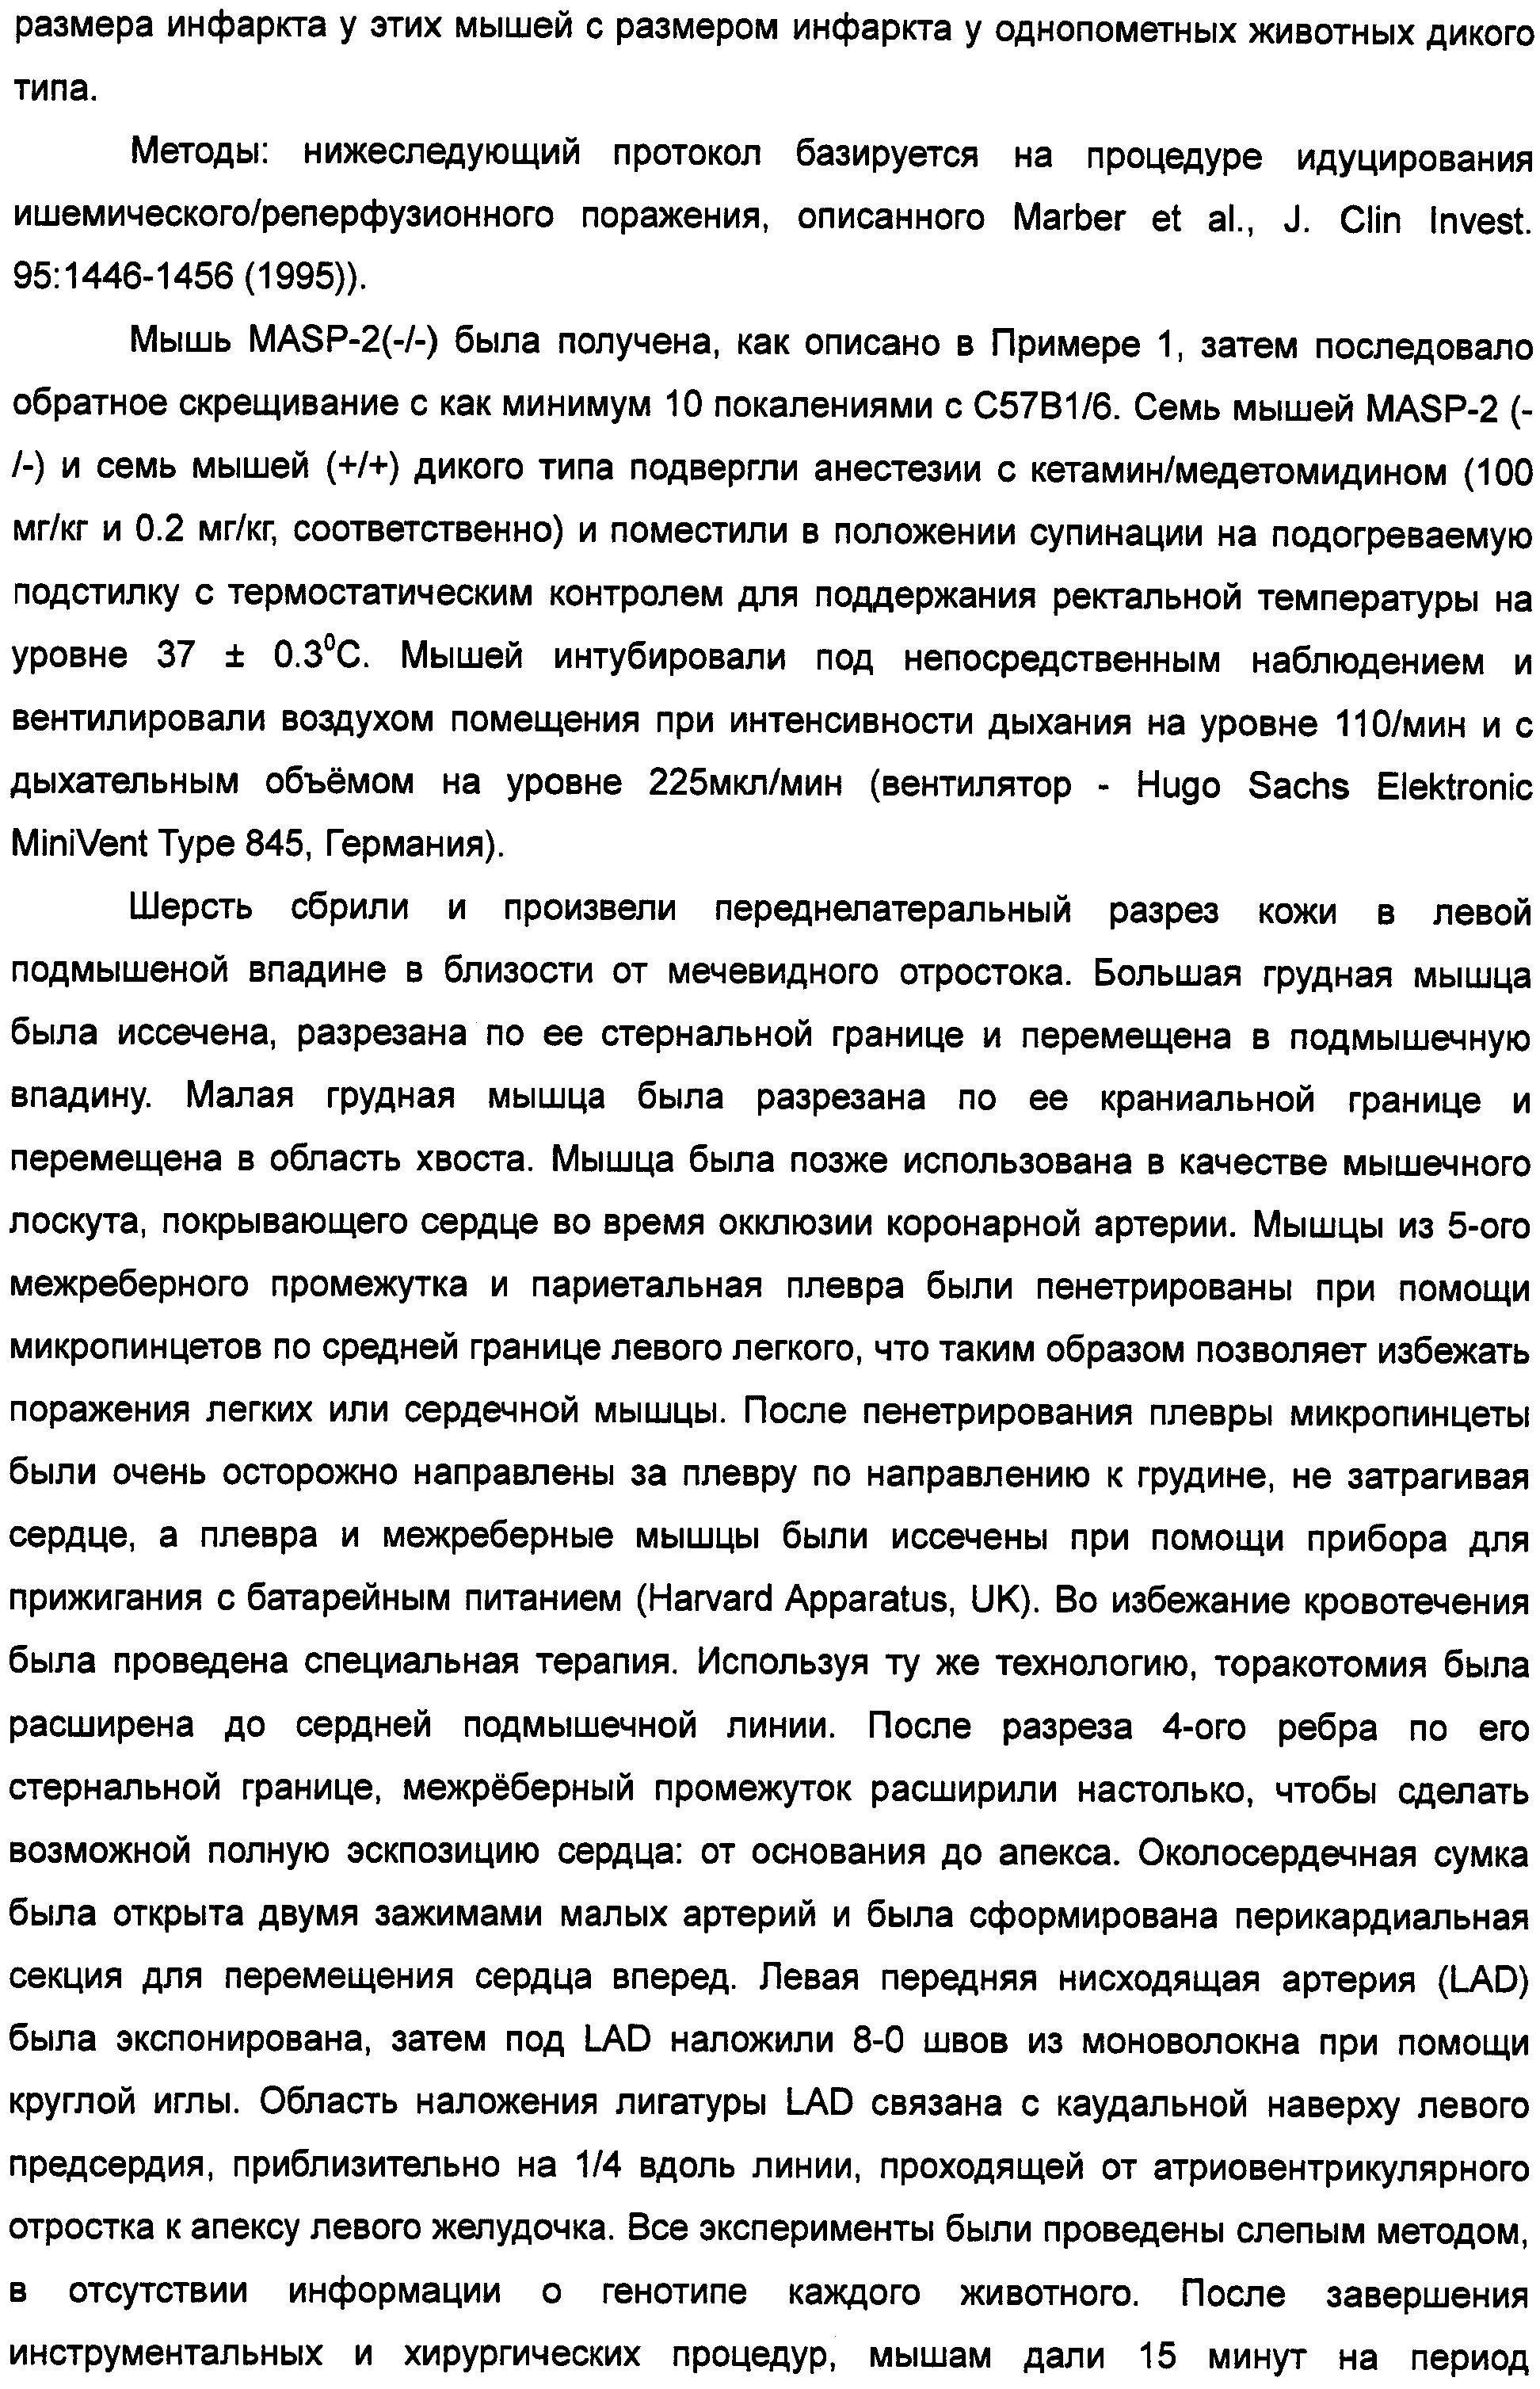 Figure 00000167